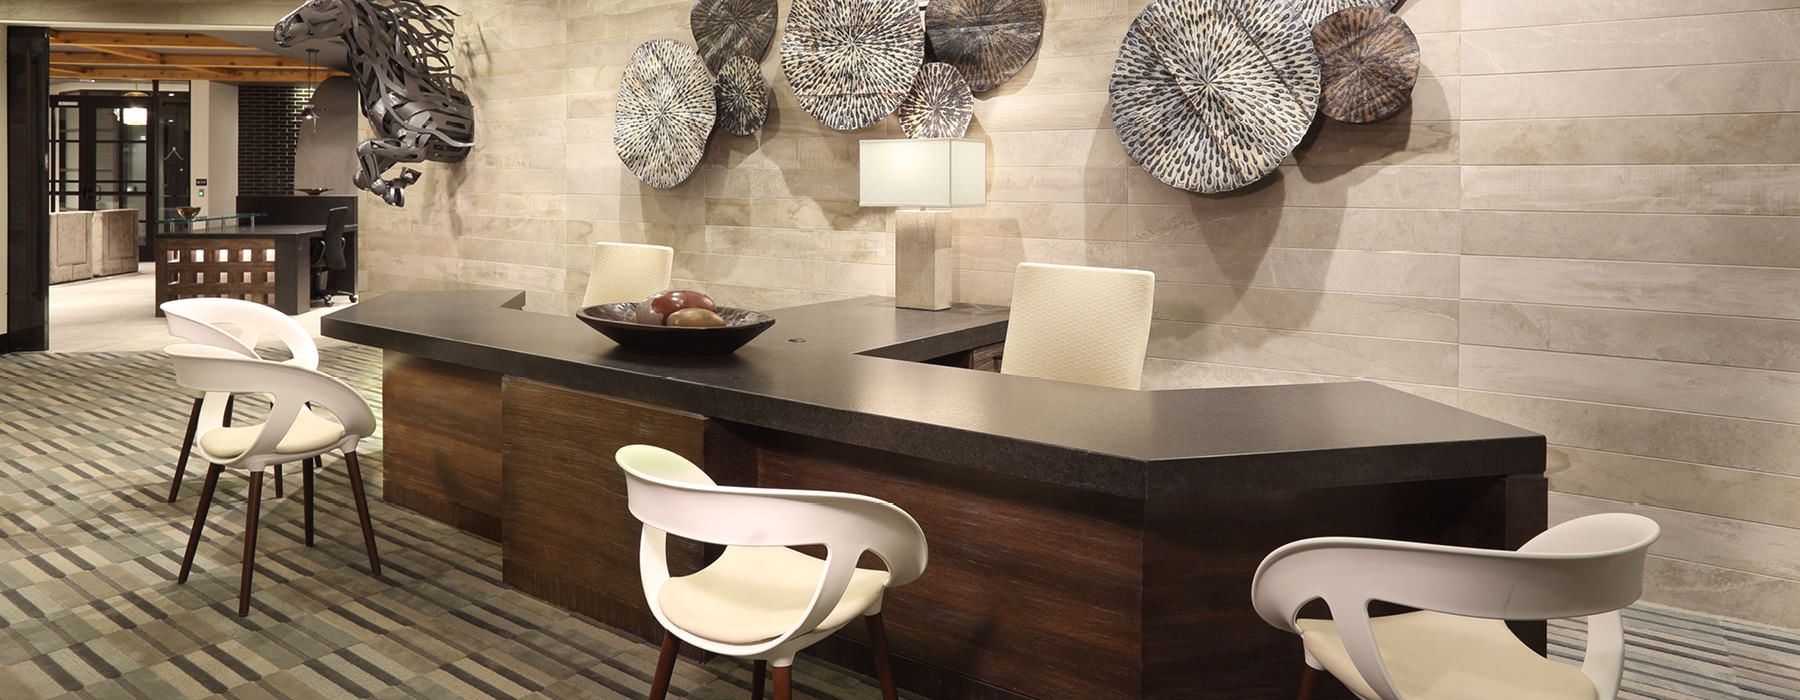 reception area in leasing center